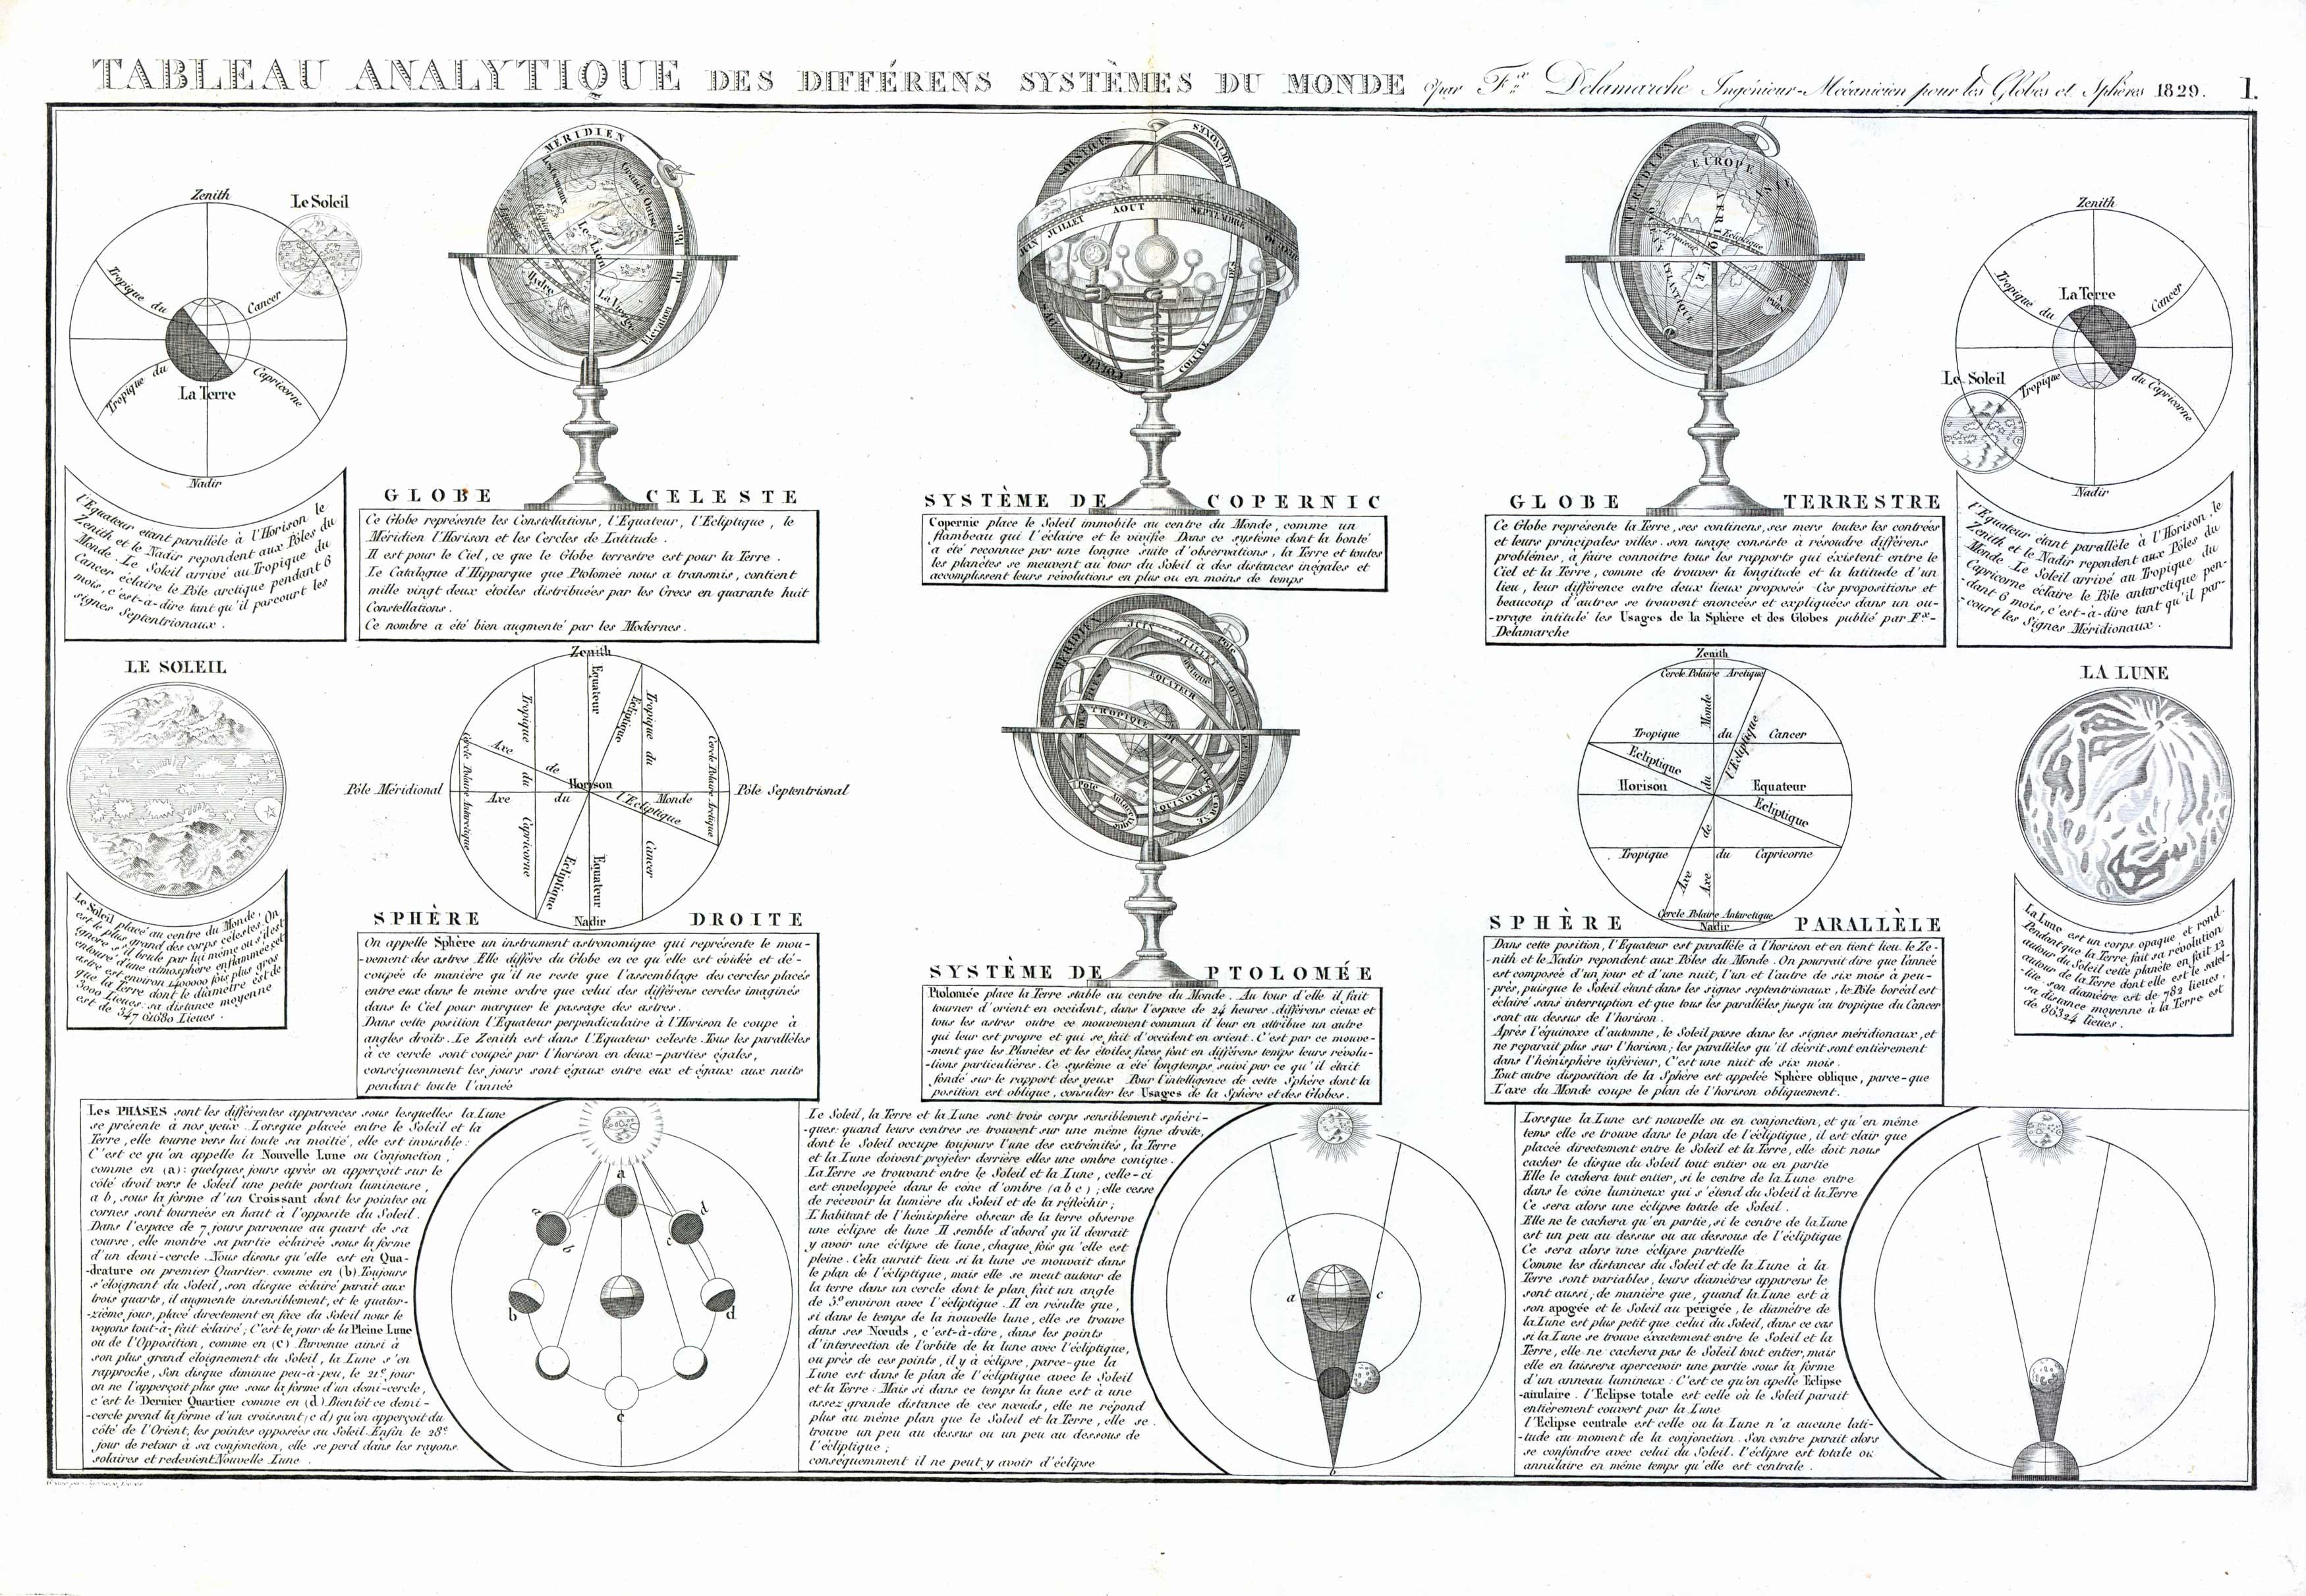 Tableau Analytique des Differens Systemes du Monde